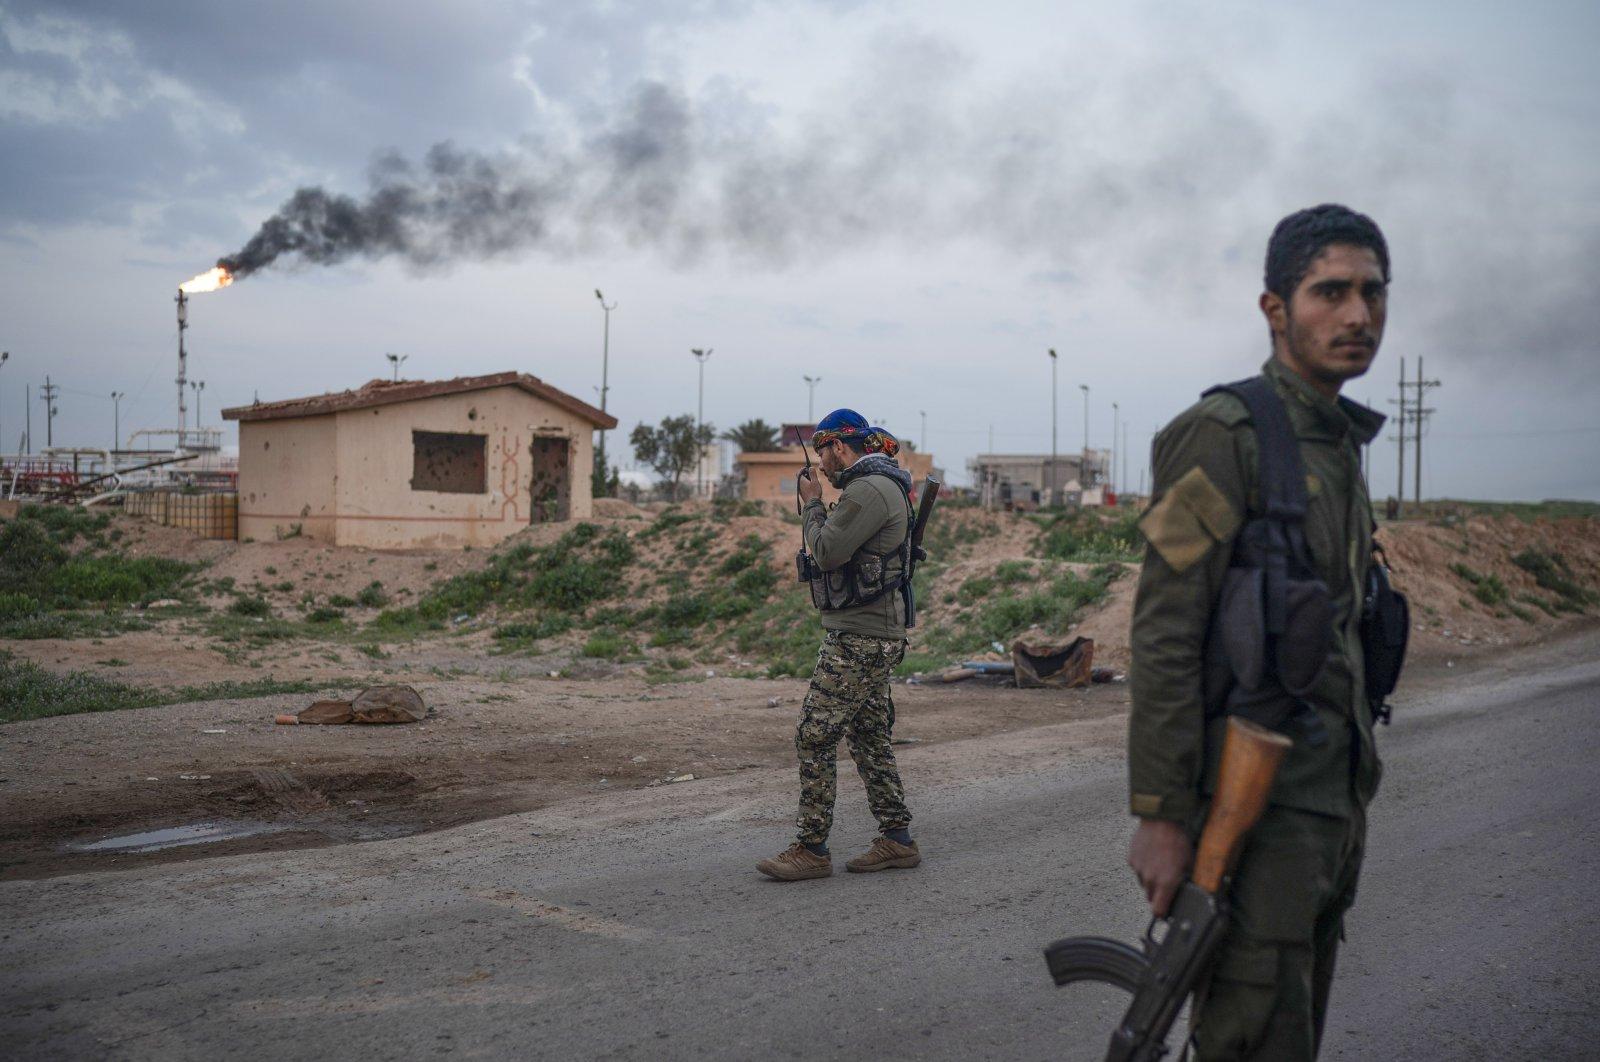 A YPG/PKK terrorist talks on his radio at a checkpoint near Omar oil field base, eastern Syria, Feb. 24, 2019. (AP File Photo)